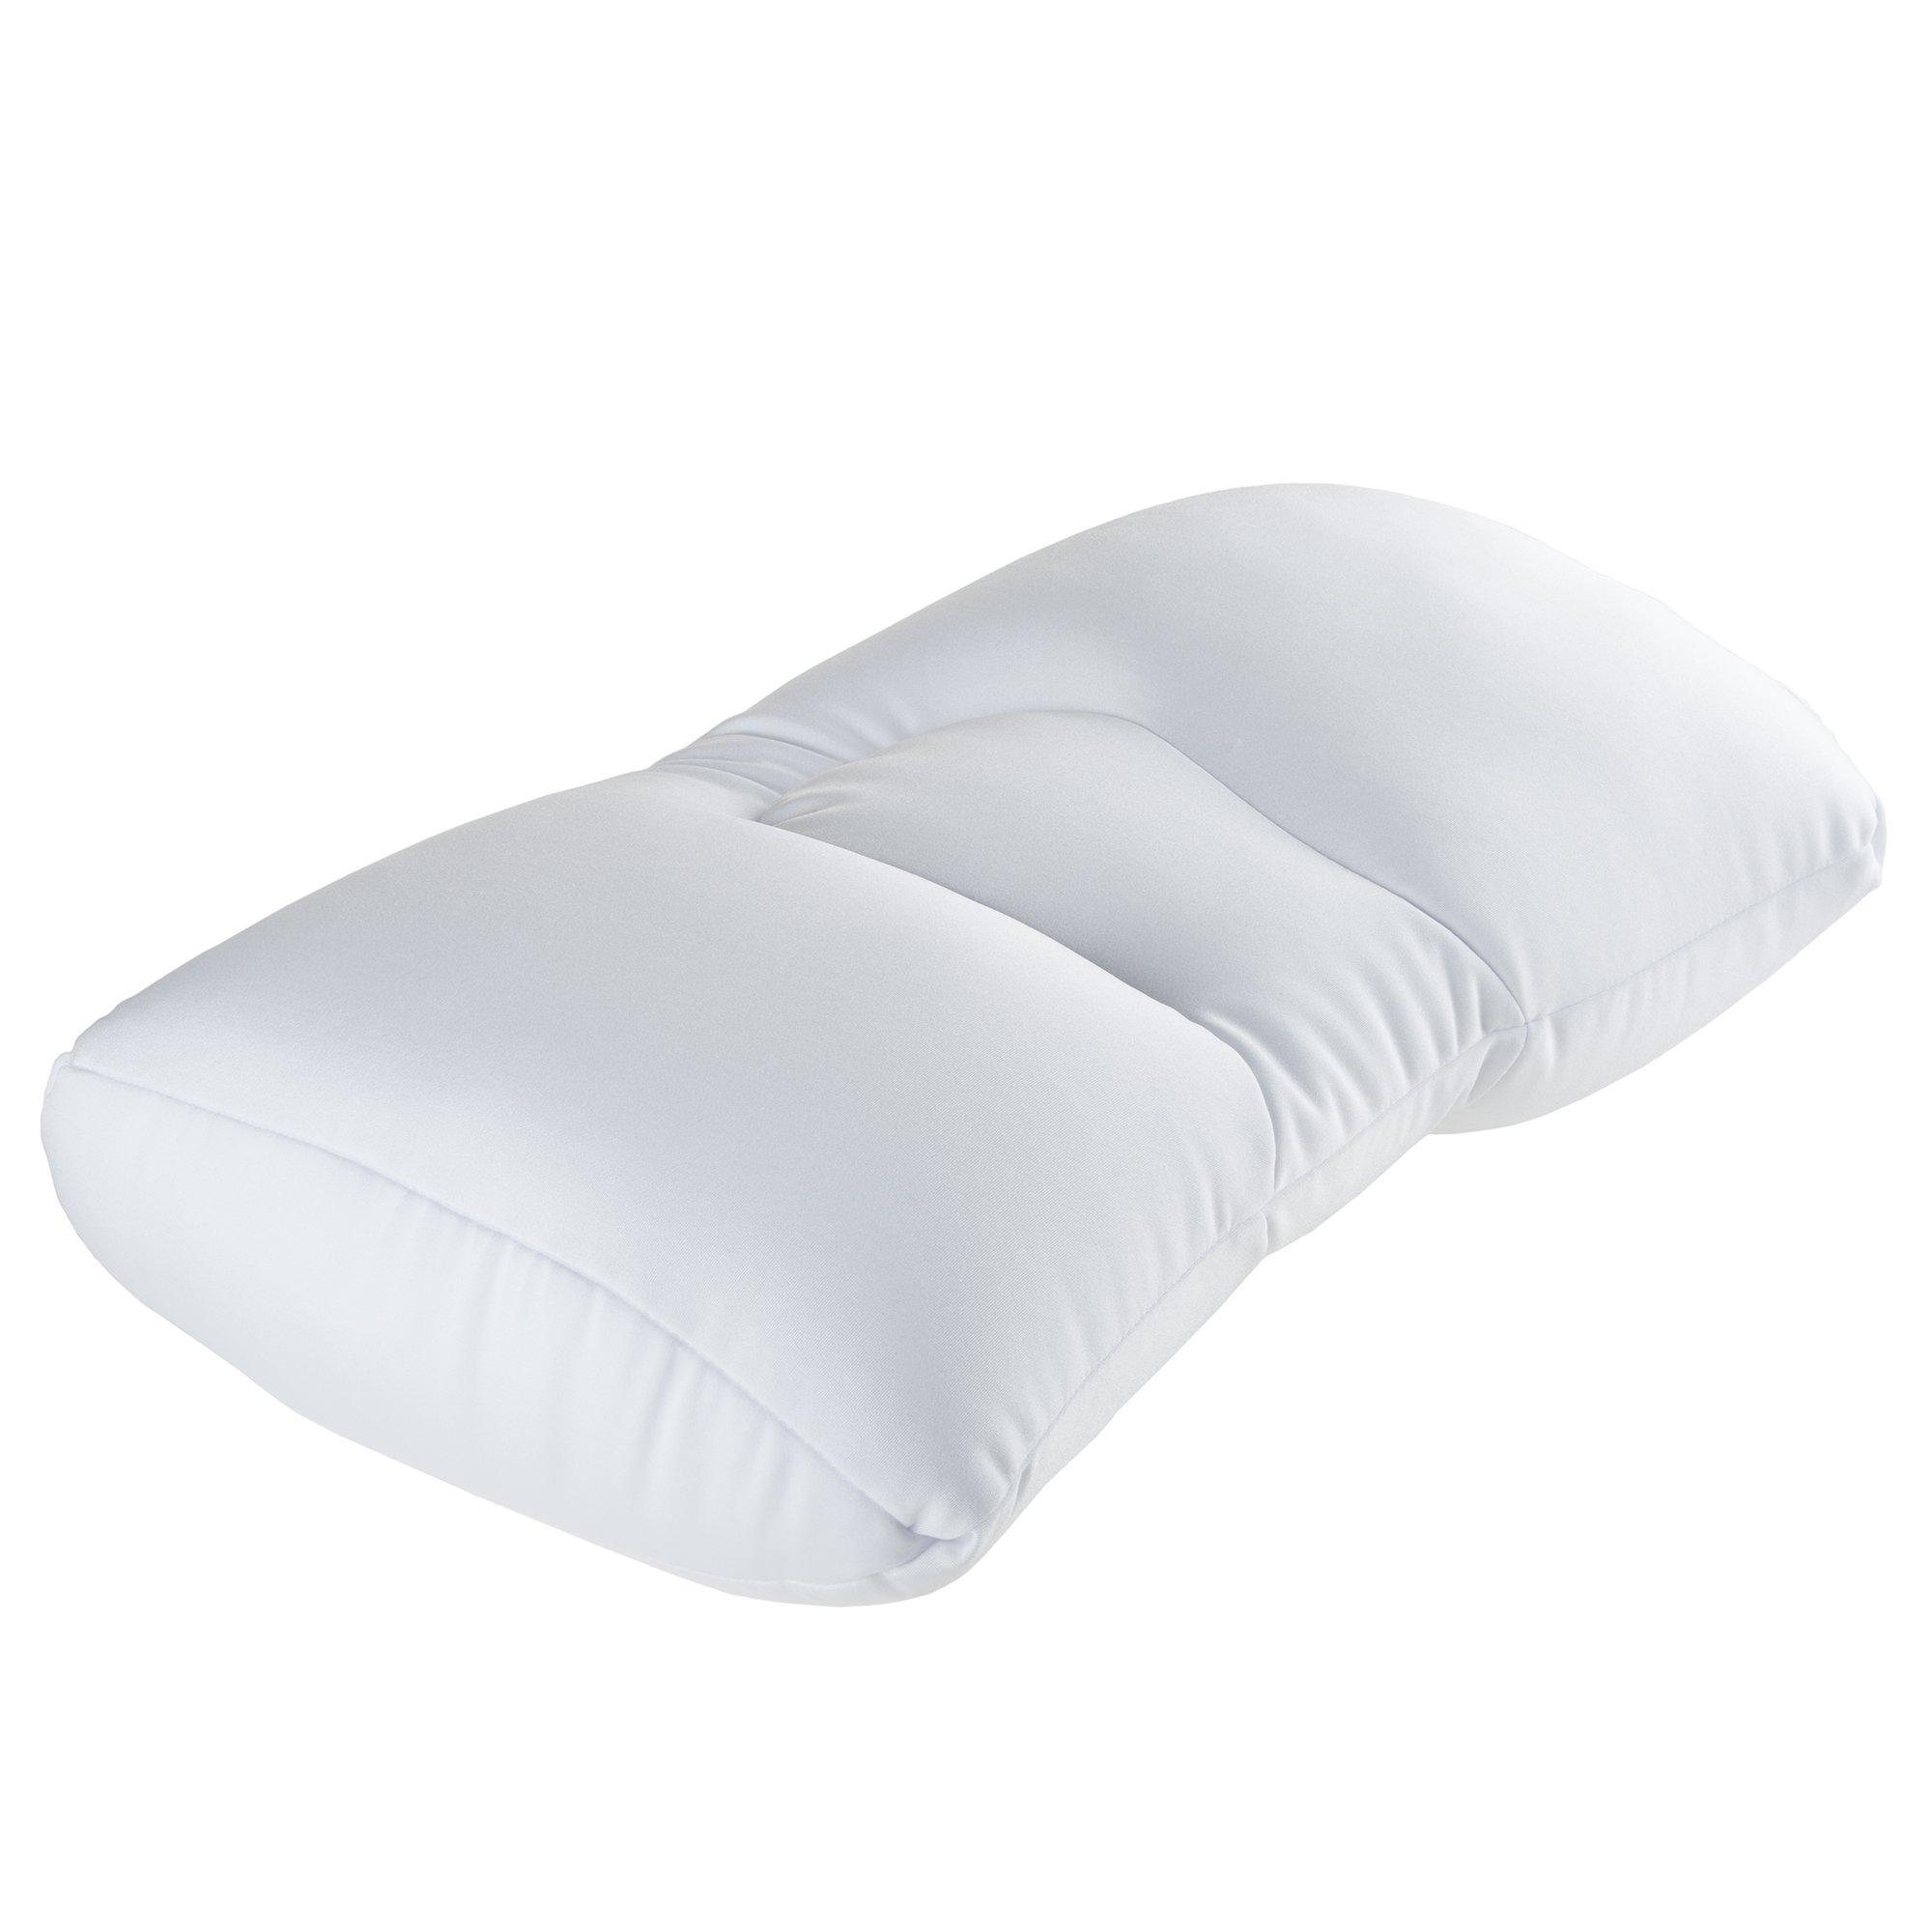 Remedy 64 879063 Microbead Pillow